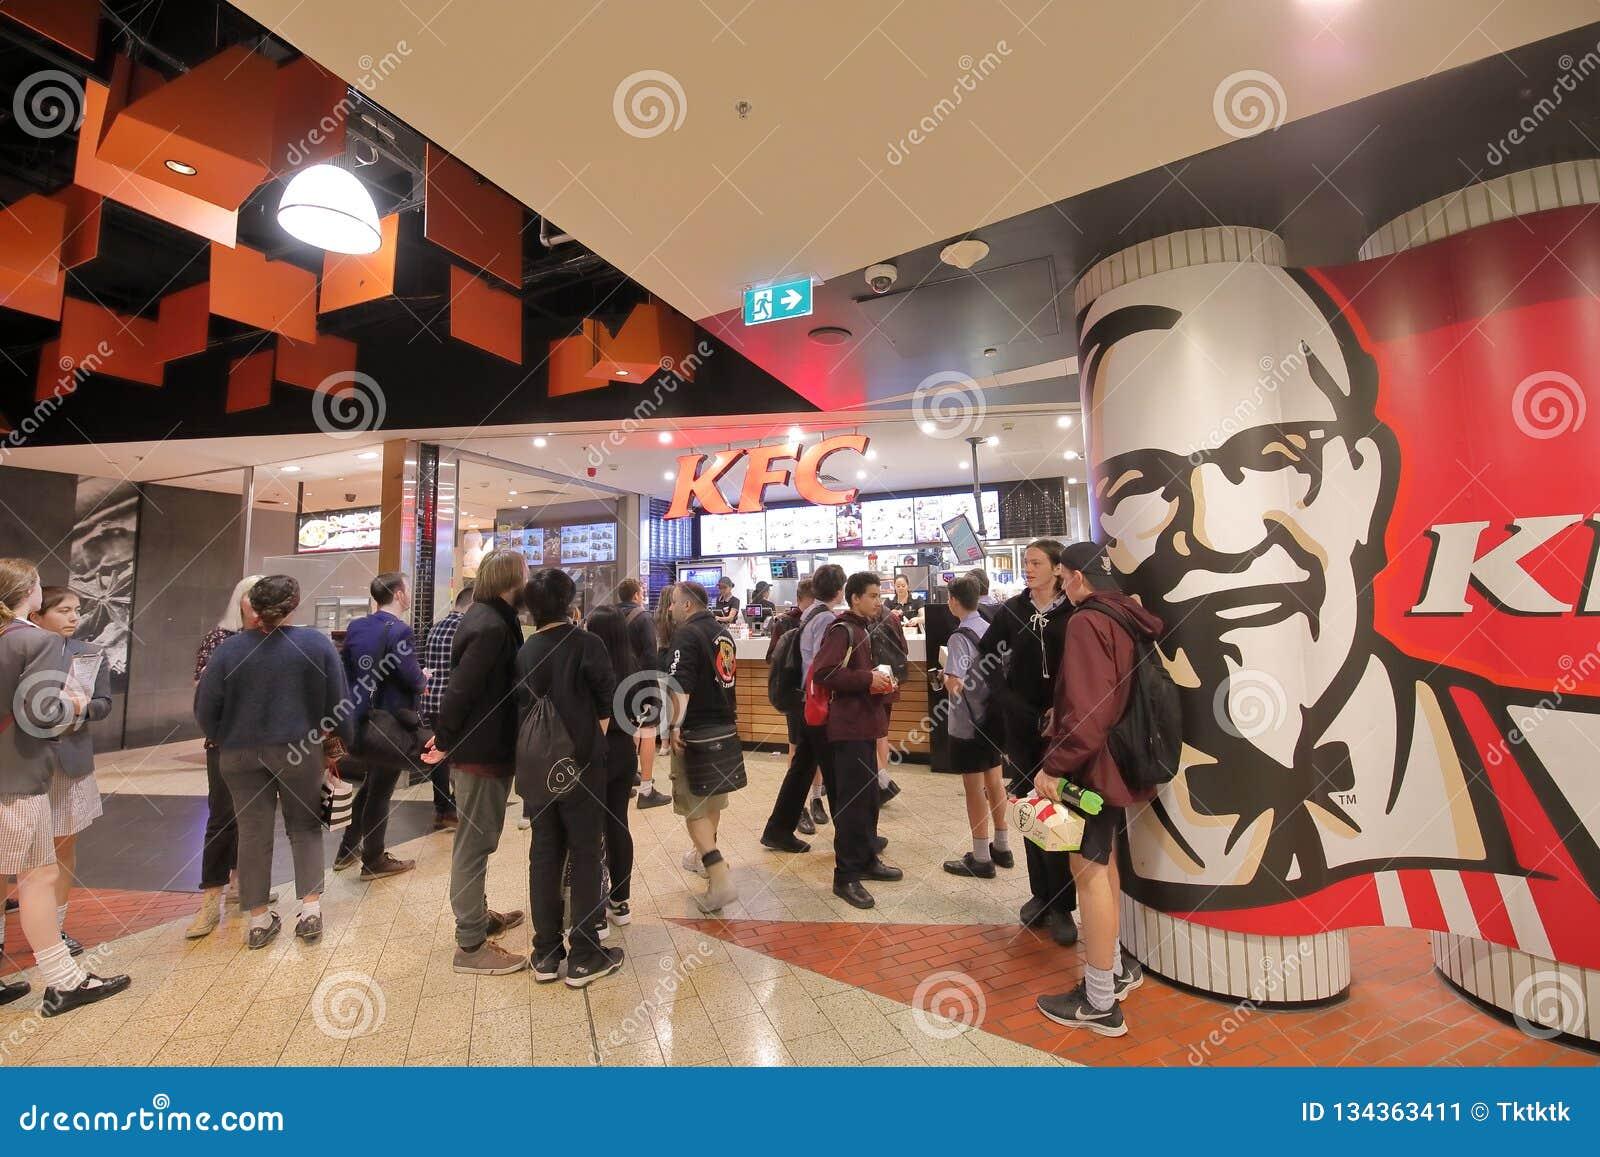 KFC fast food restaurant Melbourne Australia